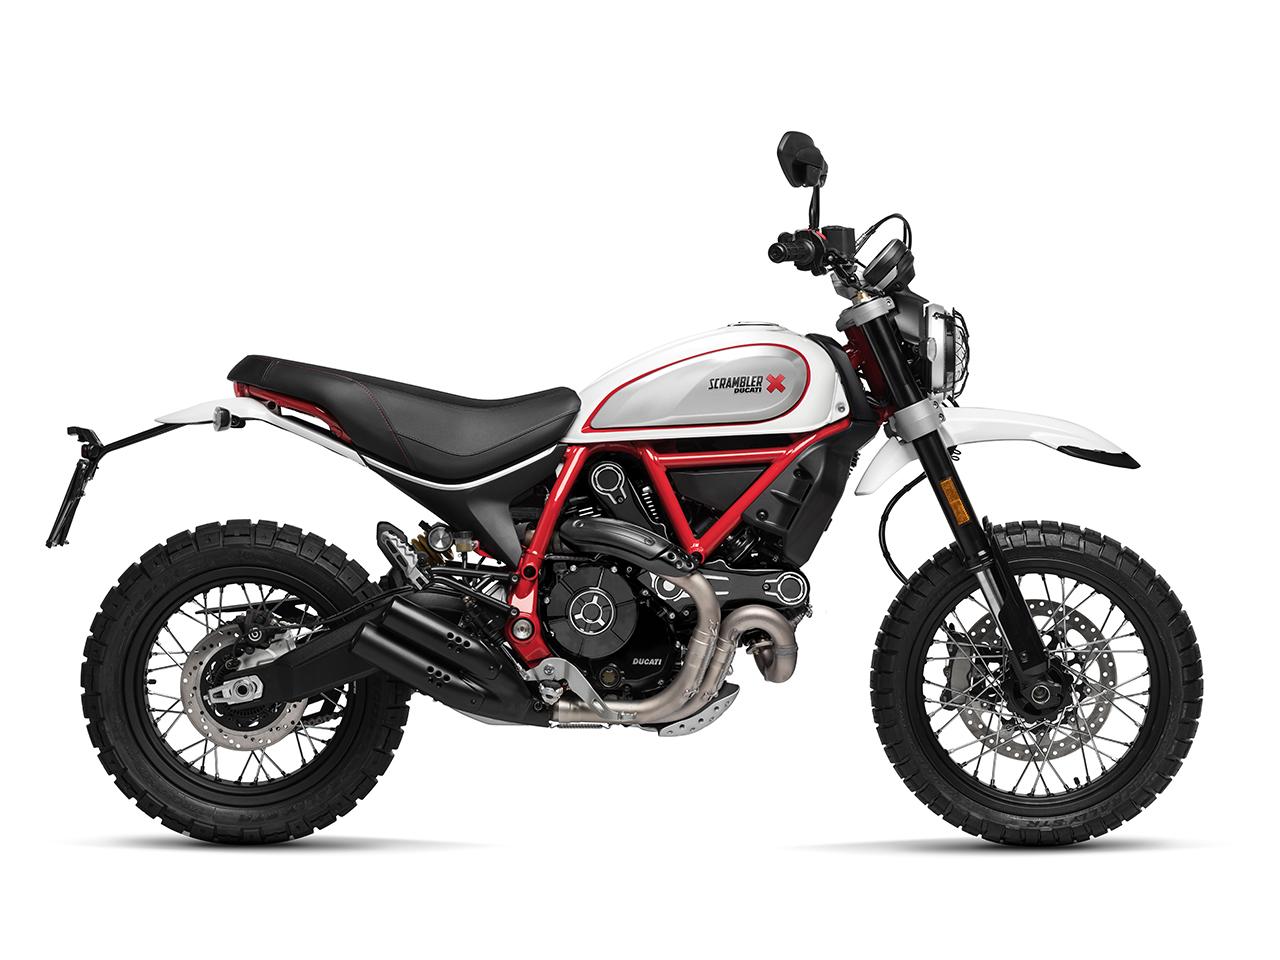 ducati scrambler desert sled 2019 white mirage motorcycles r us. Black Bedroom Furniture Sets. Home Design Ideas